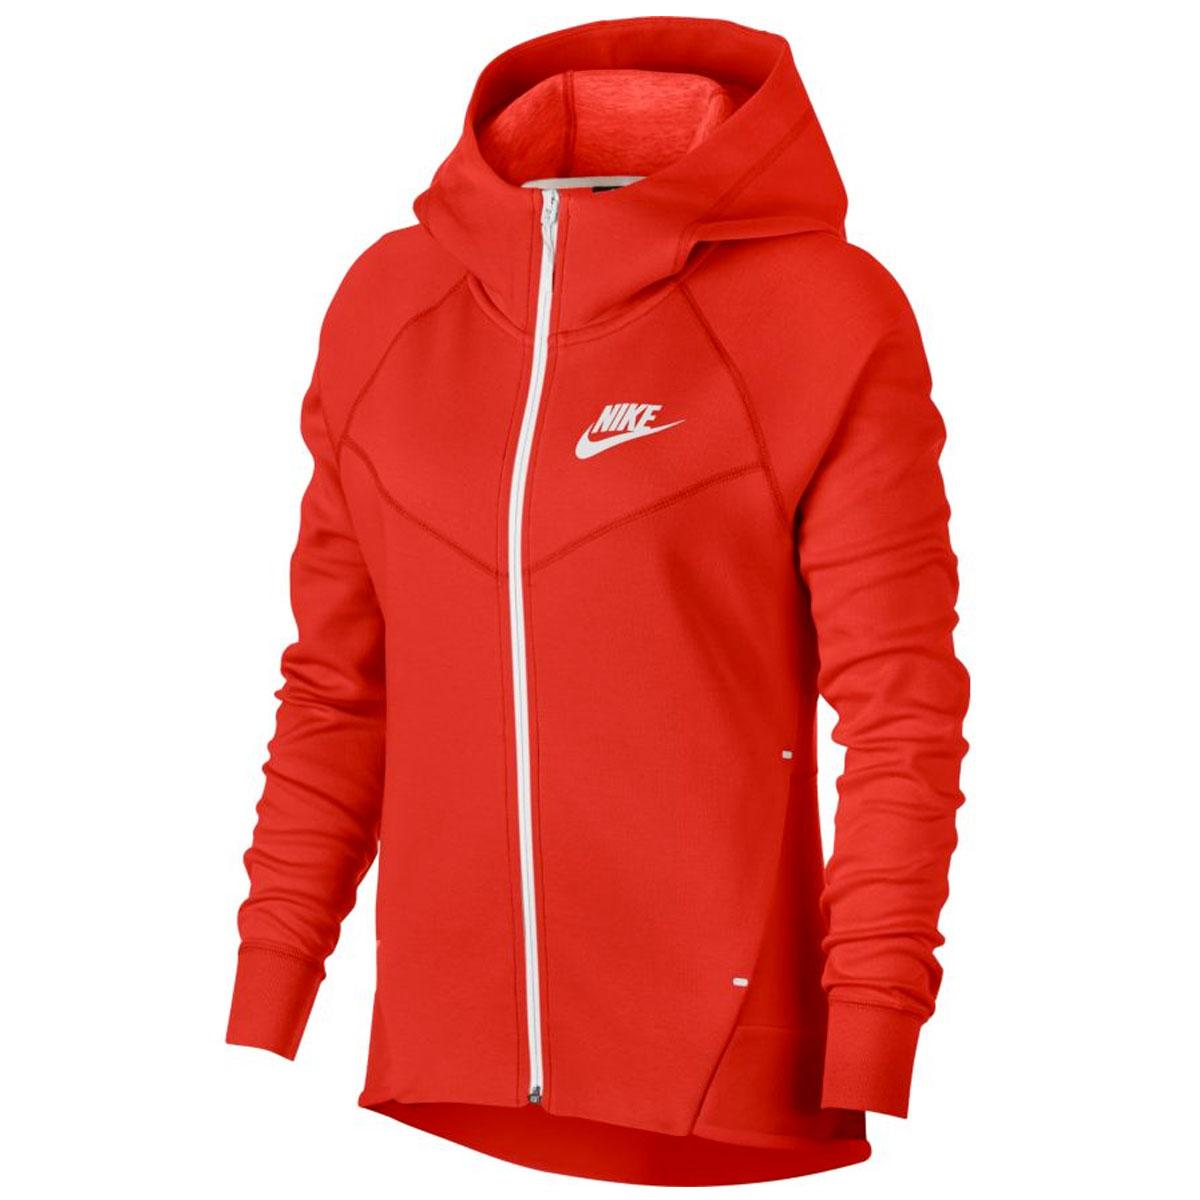 b4b03cf414fd Nike Tech Fleece Windrunner Full Zip Hoodie. 930759 634 Habanero Red White